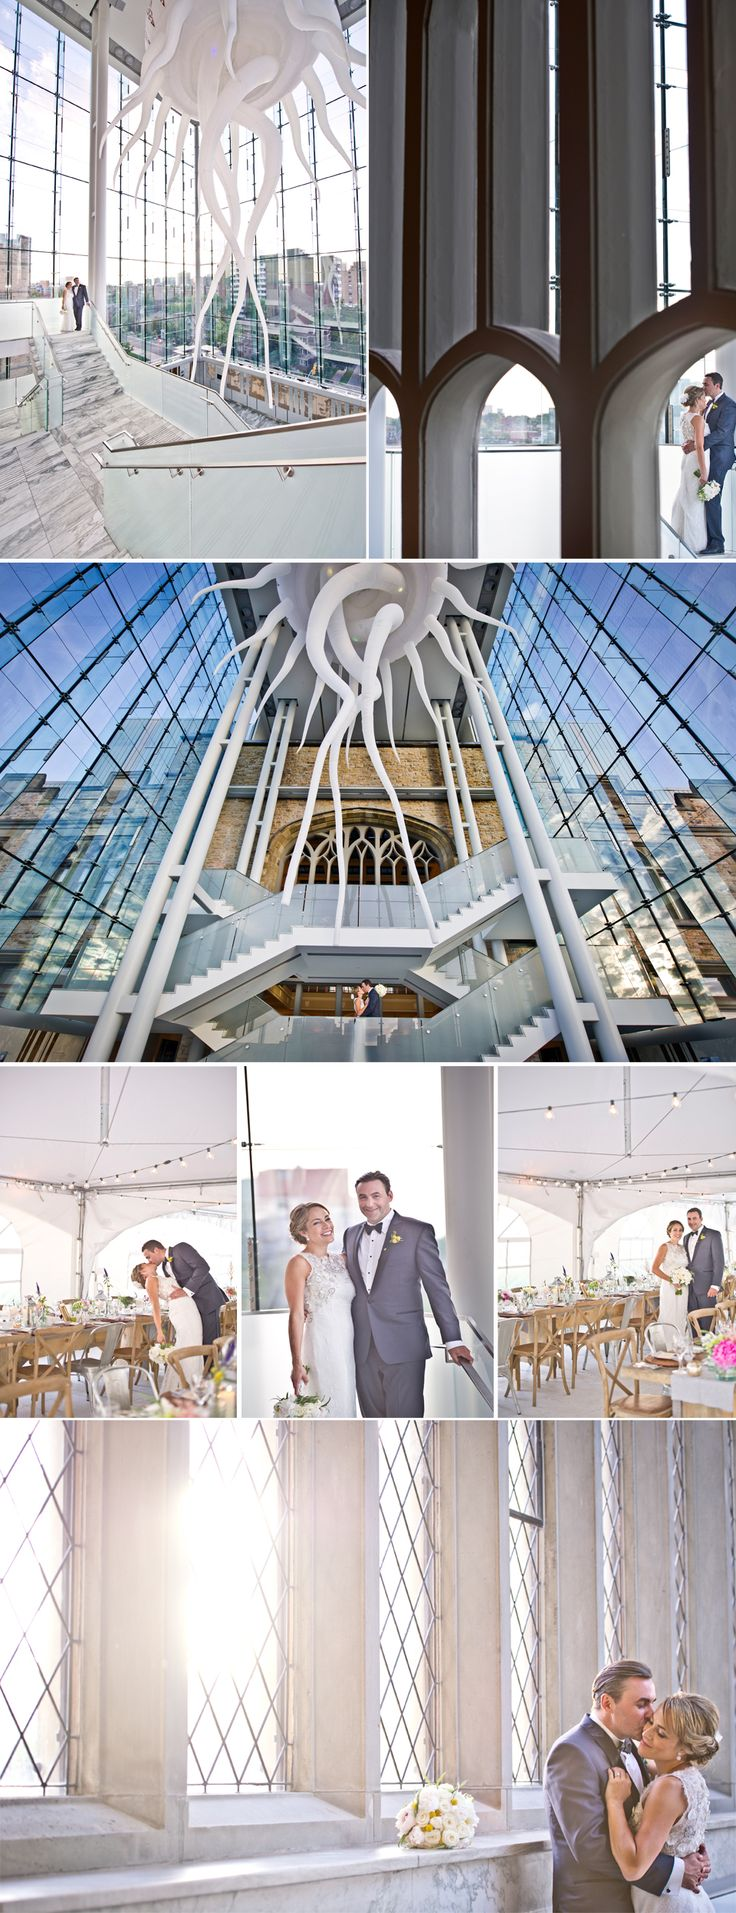 Ottawa Wedding Photographer   Chateau Laurier  Museum of Nature   Lindsay Muciy Photography   Wedding Photographer Montreal